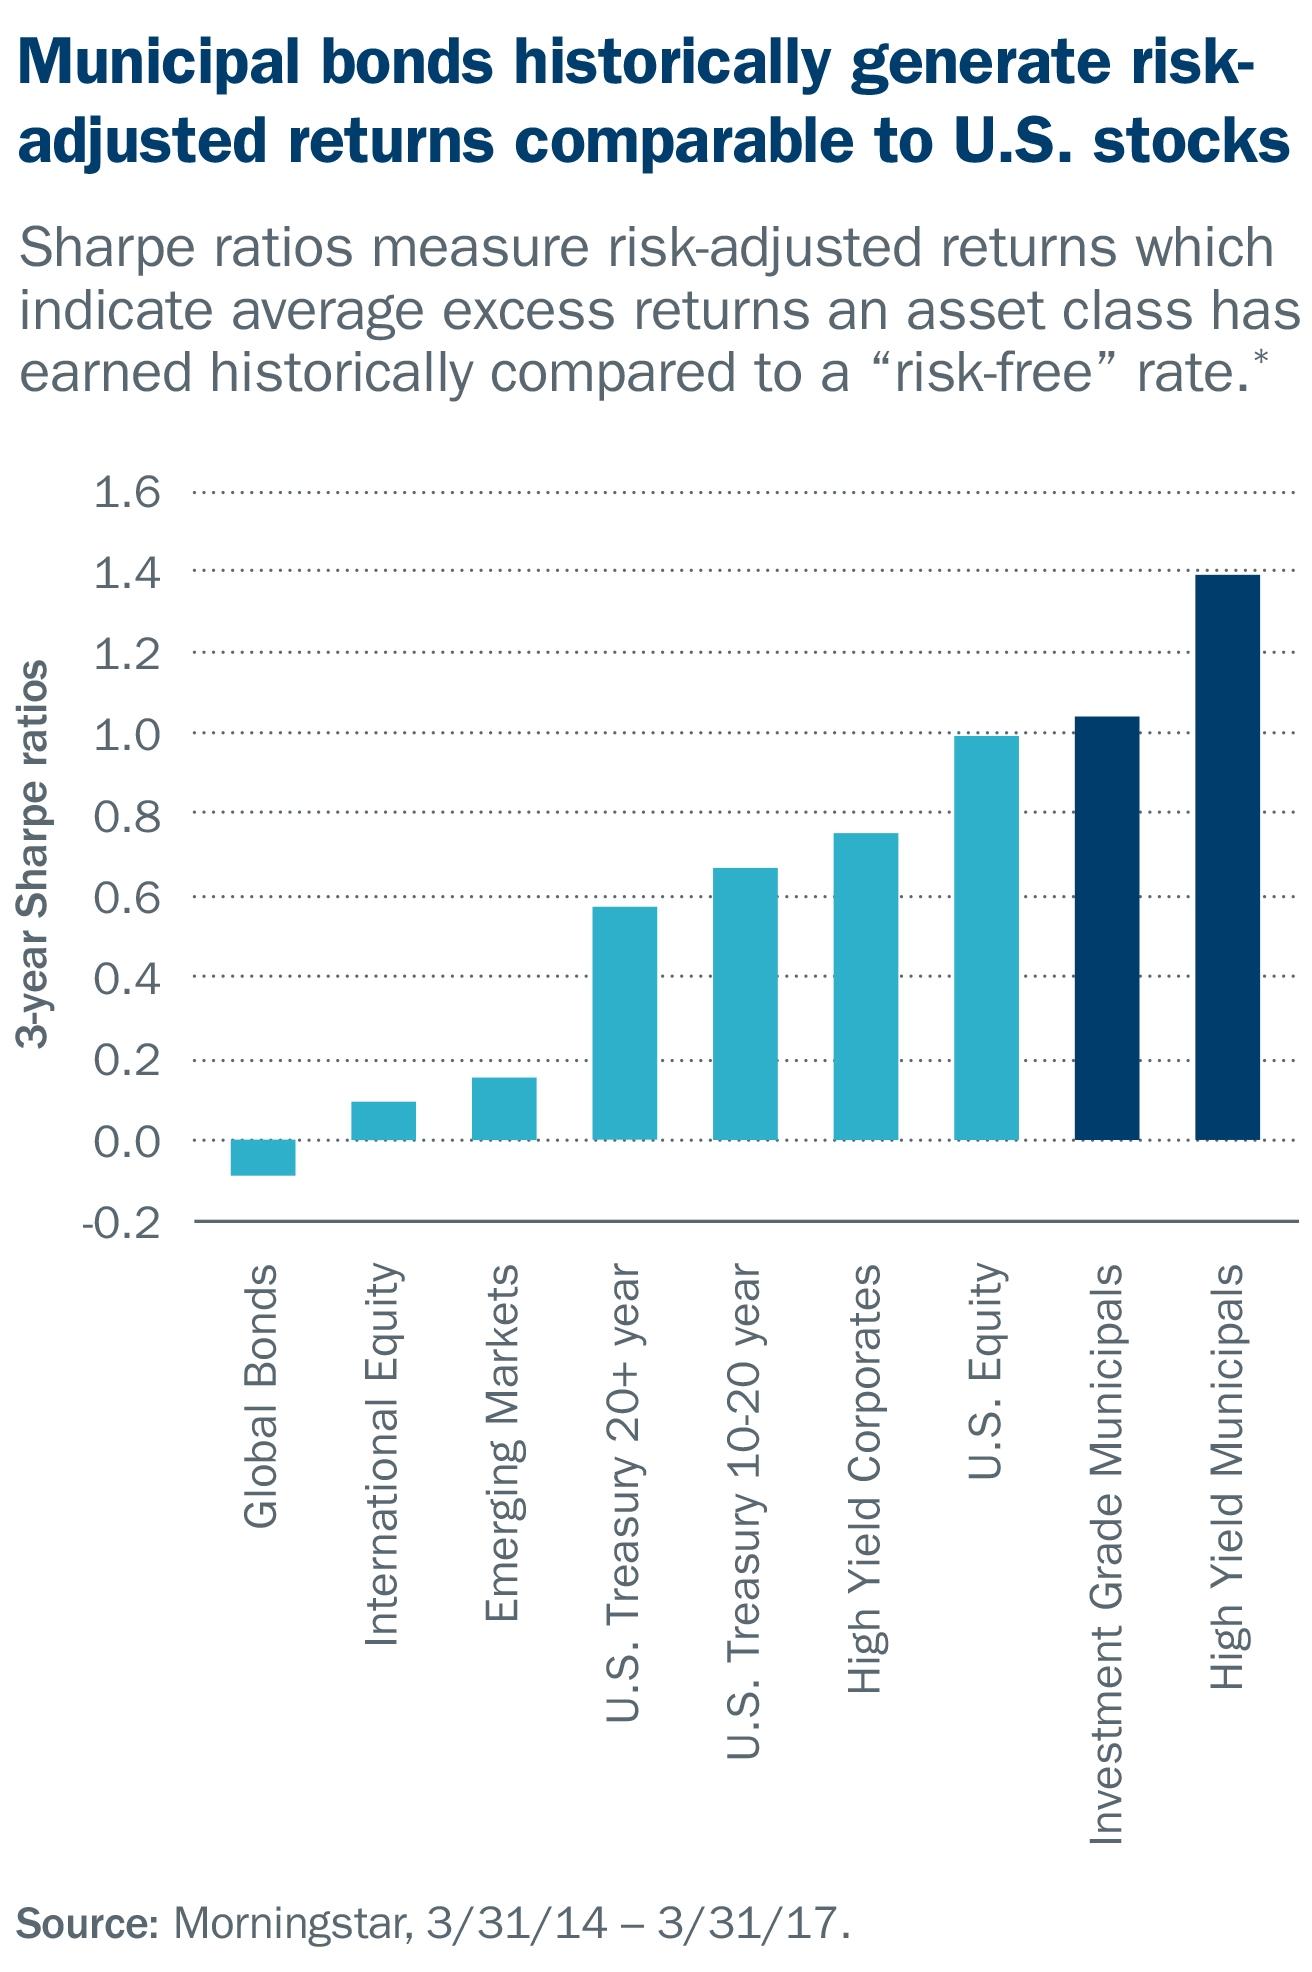 Municipal bonds generate risk-adjusted returns comparable to U.S. stocks